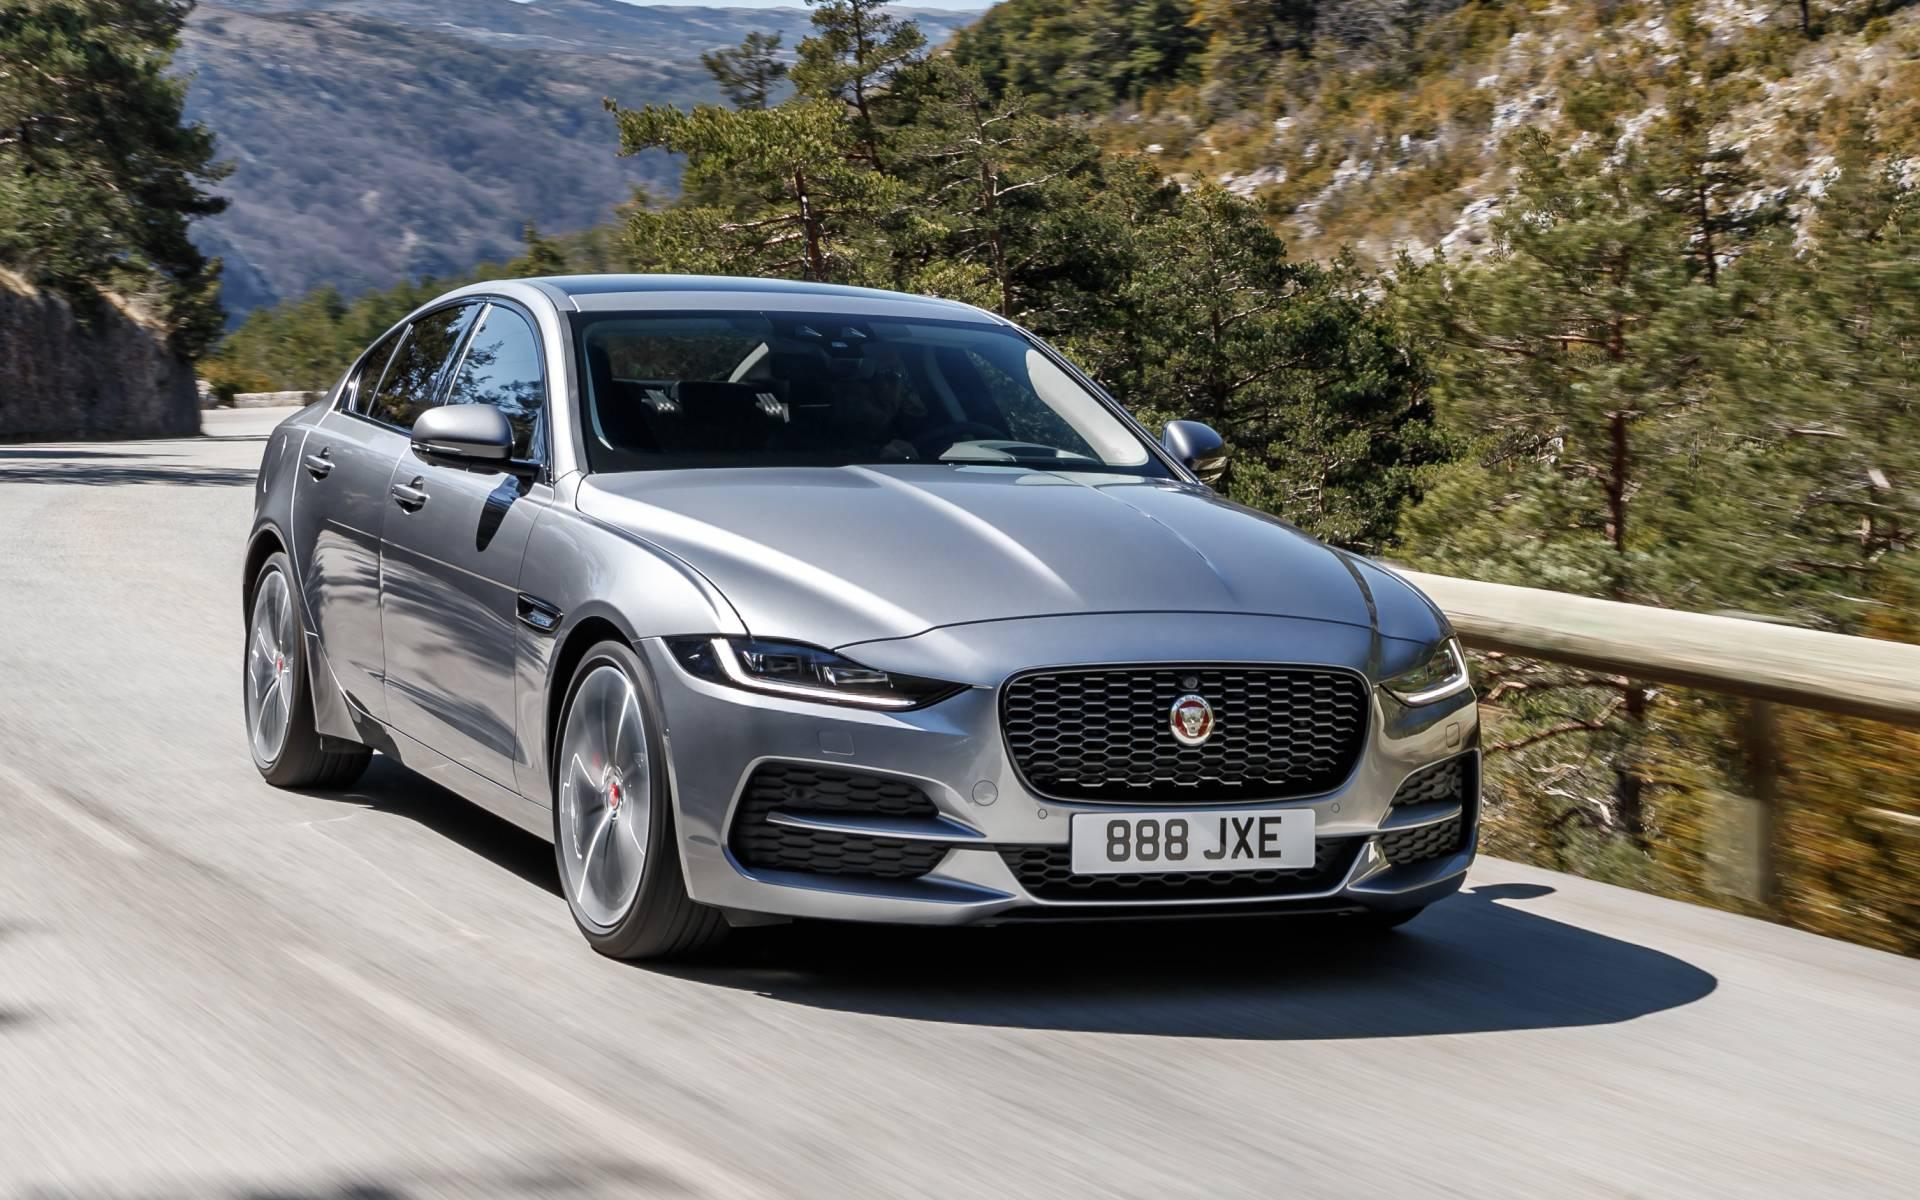 2020 Jaguar XE photos - 1/6 - The Car Guide